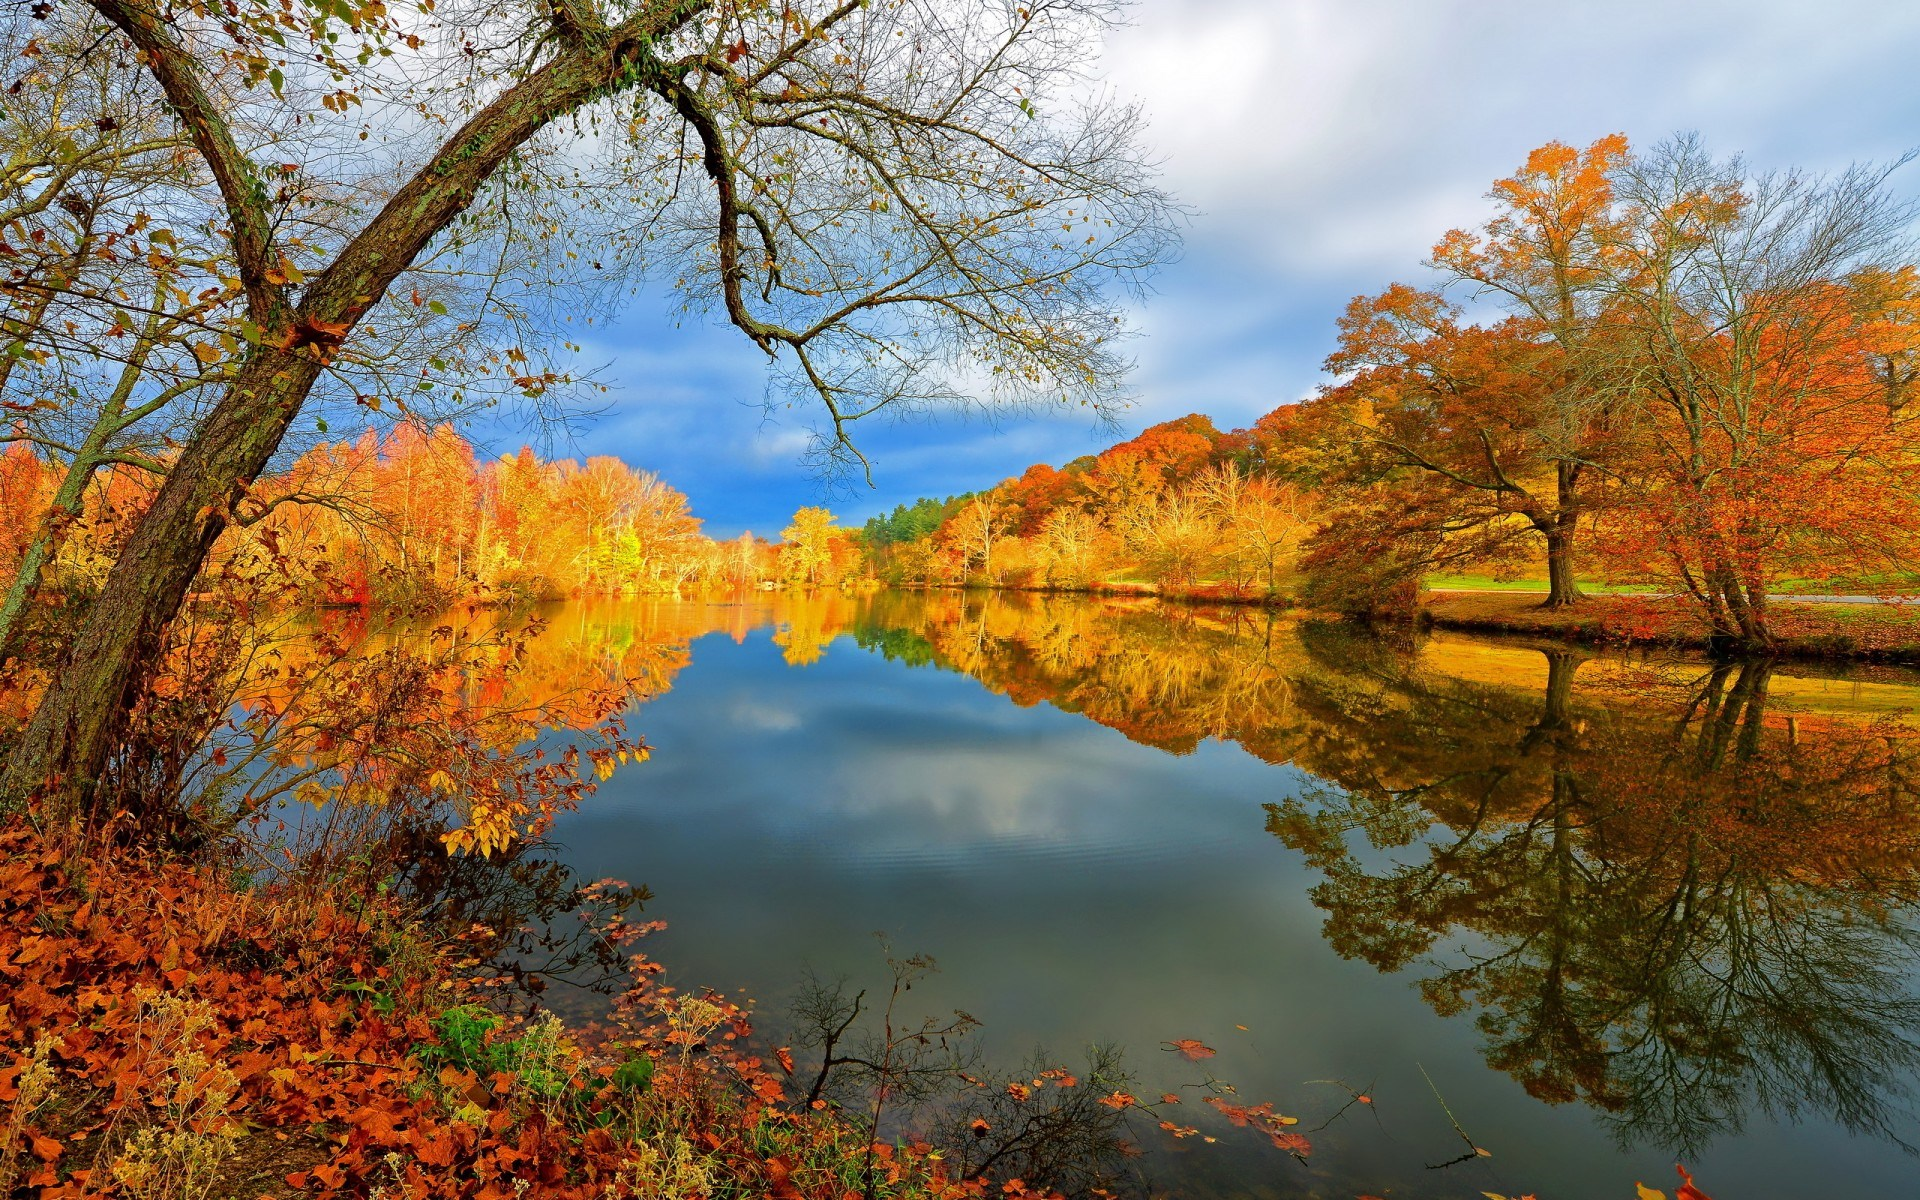 autumn landscape lake nature 1200 1920